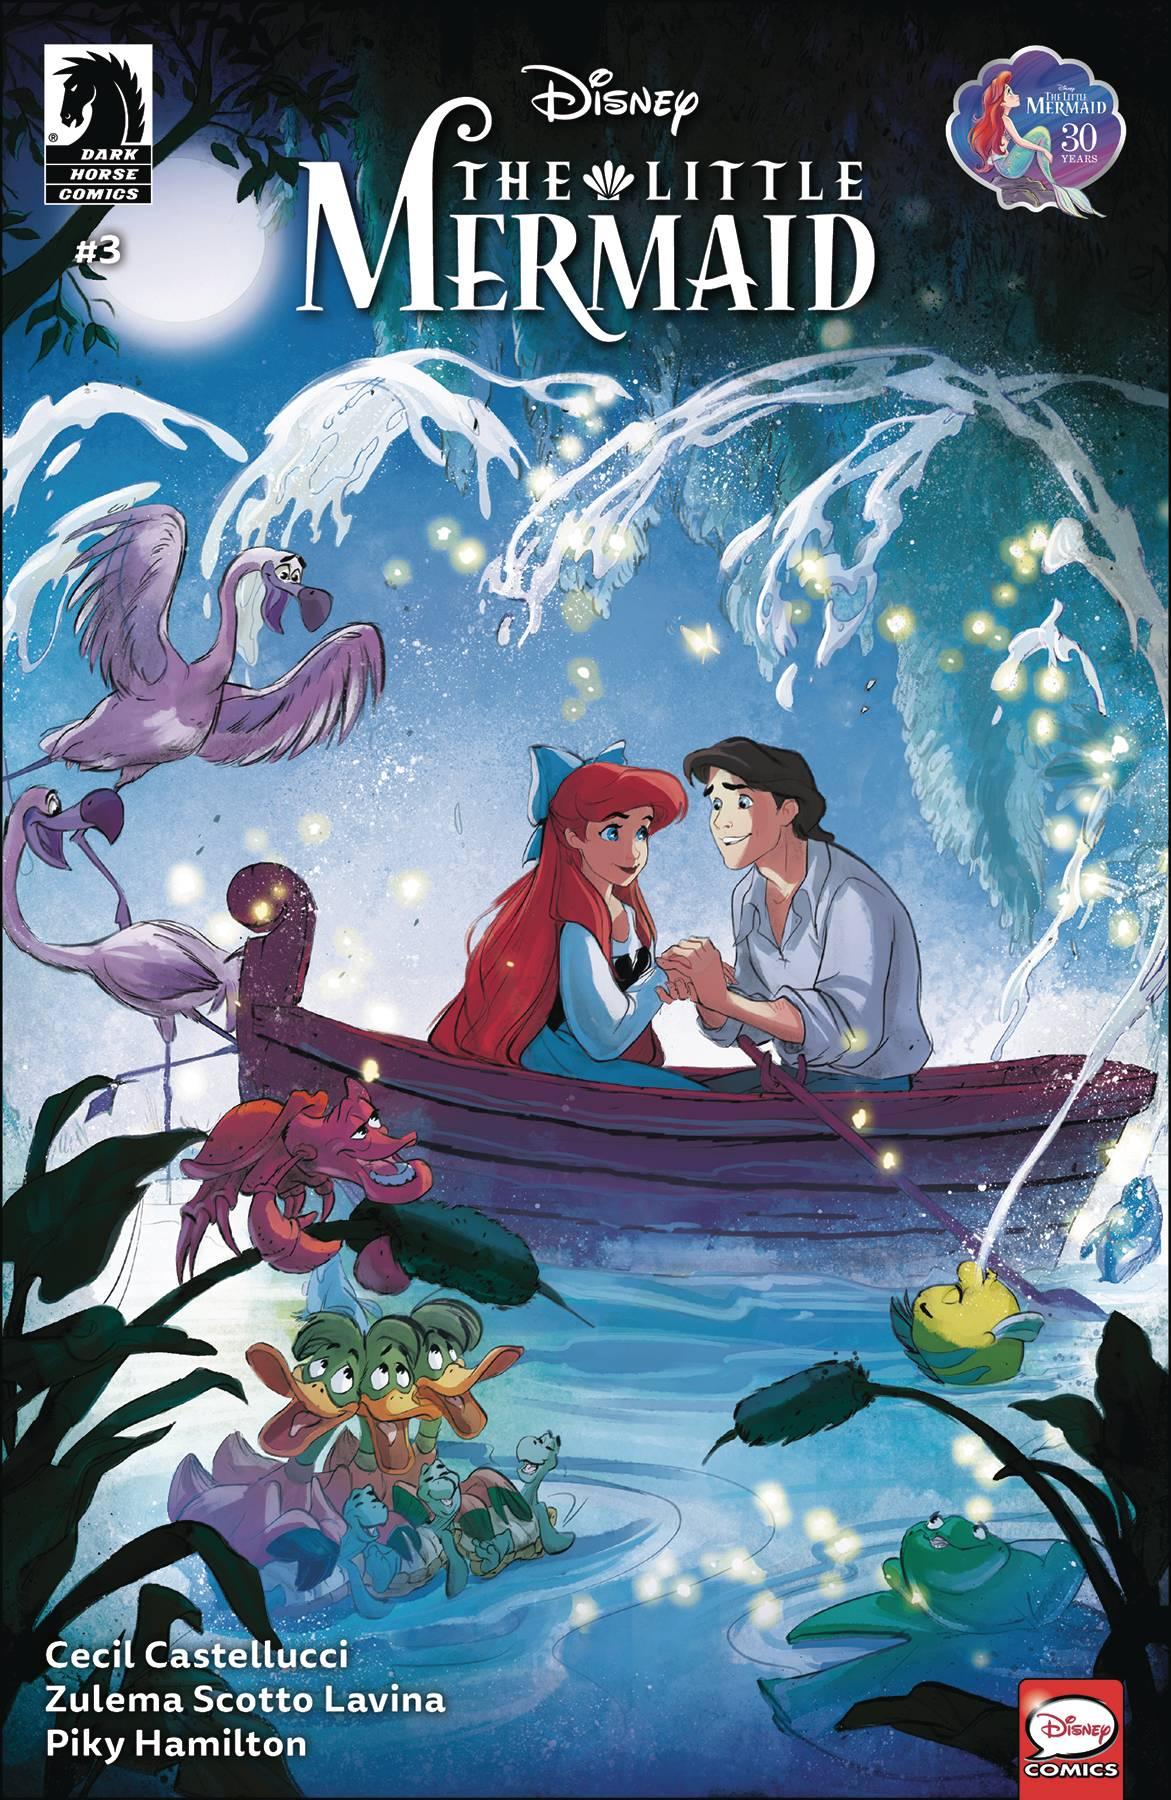 Disney The Little Mermaid #3 (2020)